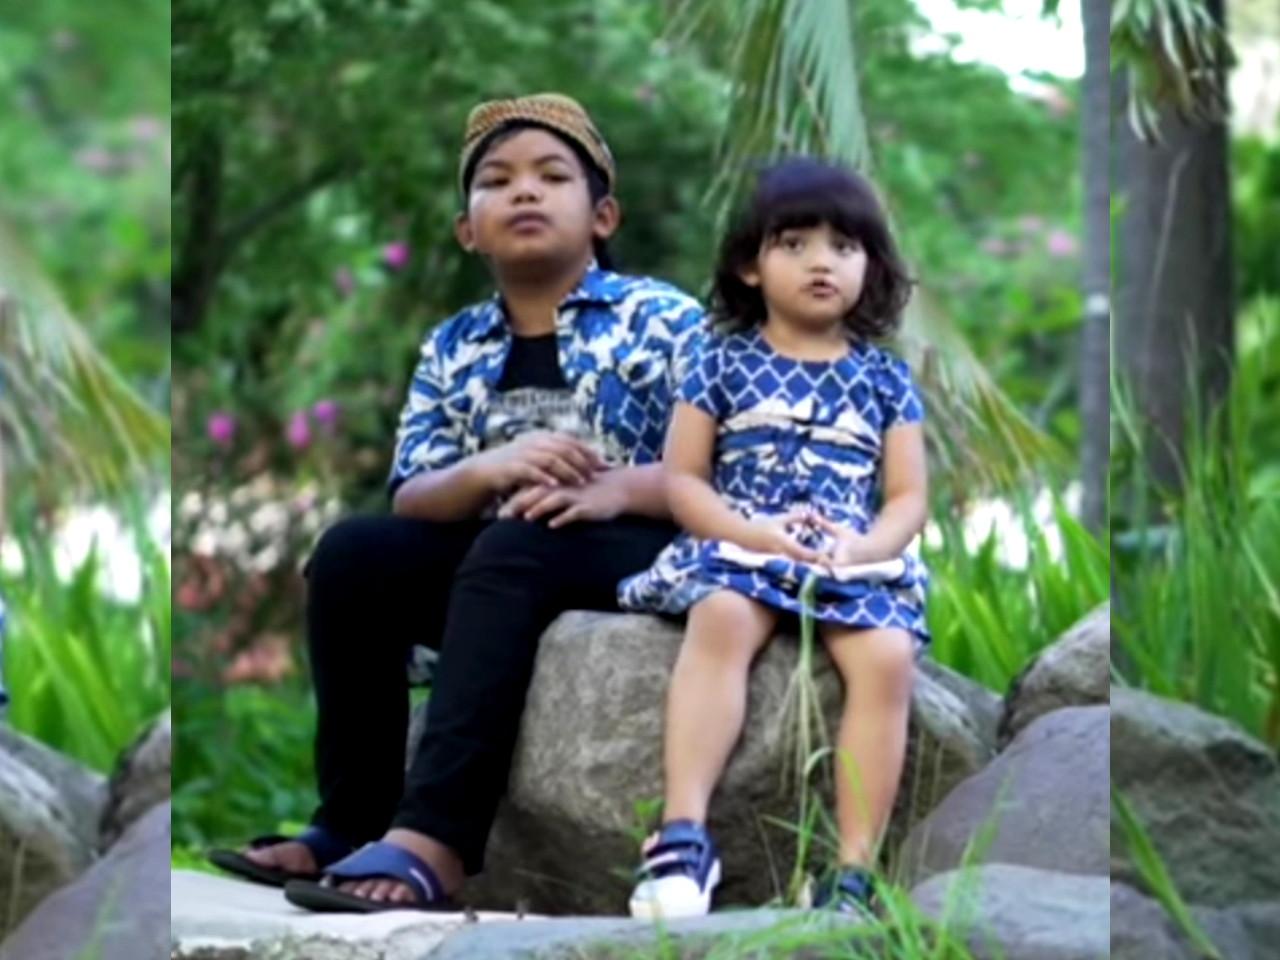 Download Lagu Bapak - Saka & Seika ft Betrand peto Putra Onsu